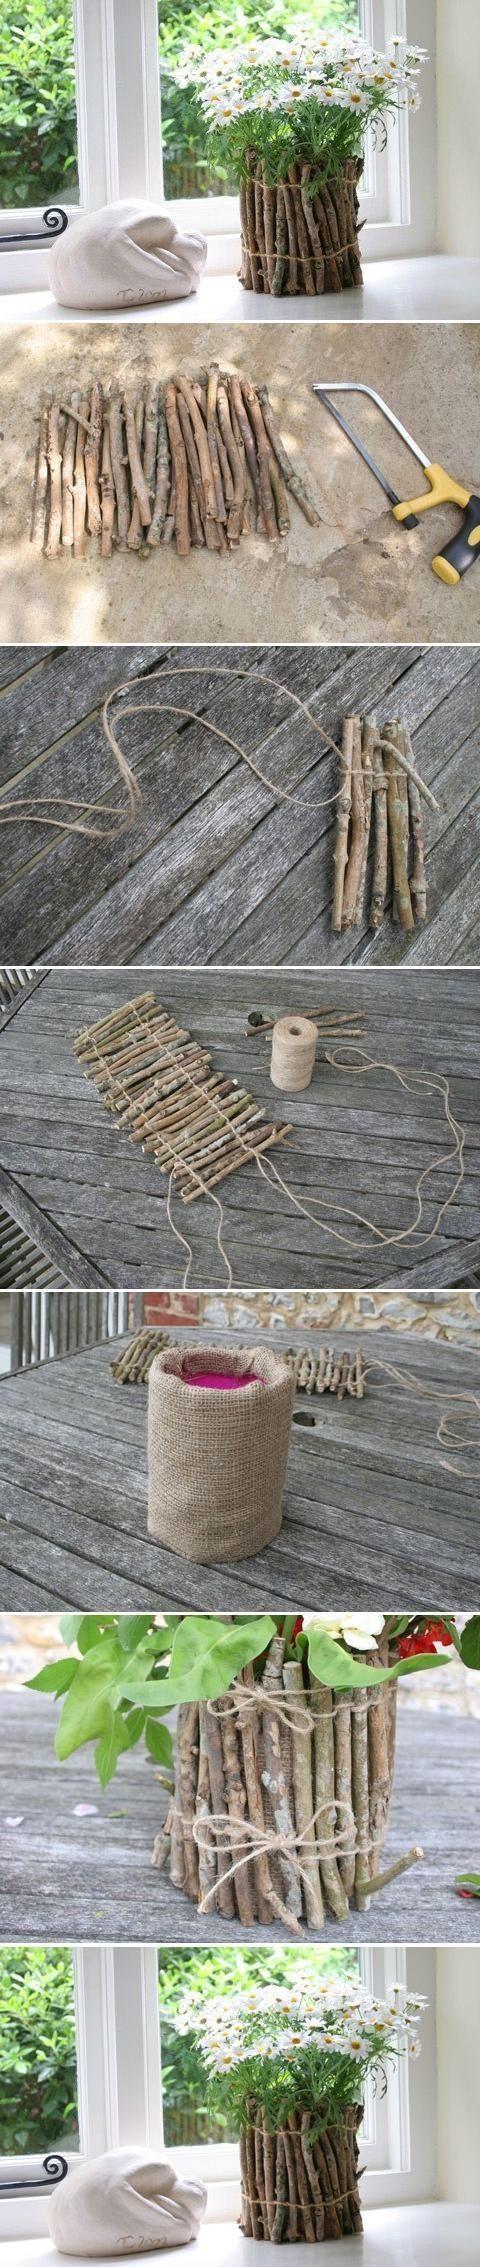 DIY Centro de margaritas